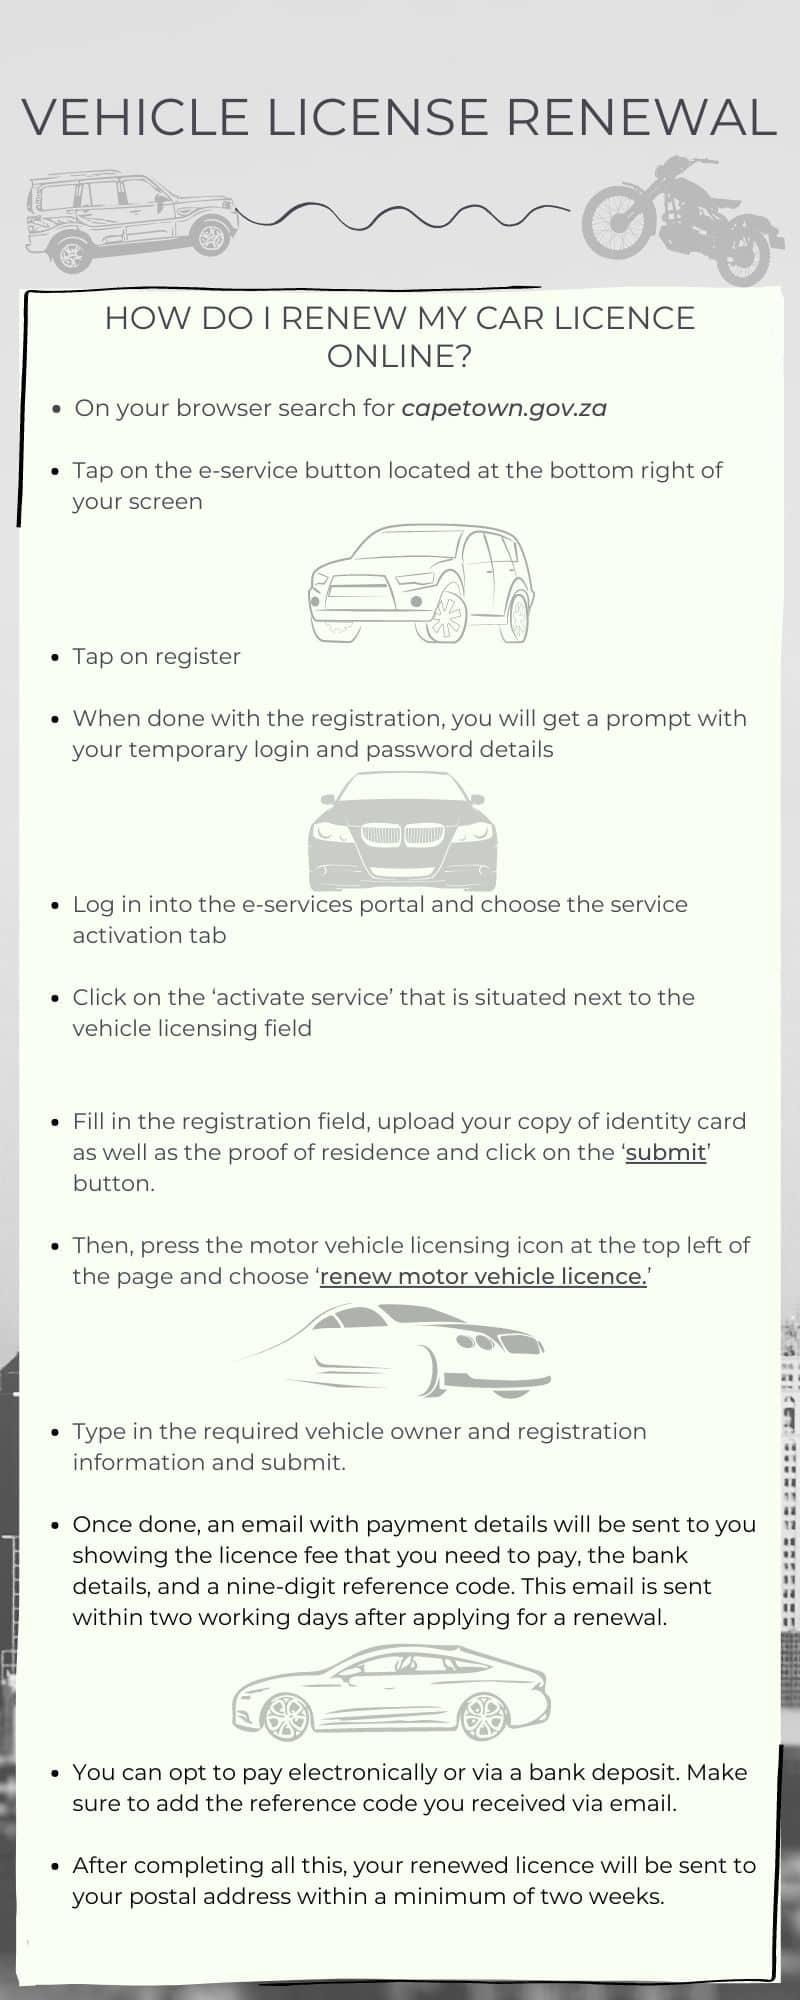 Vehicle license renewal